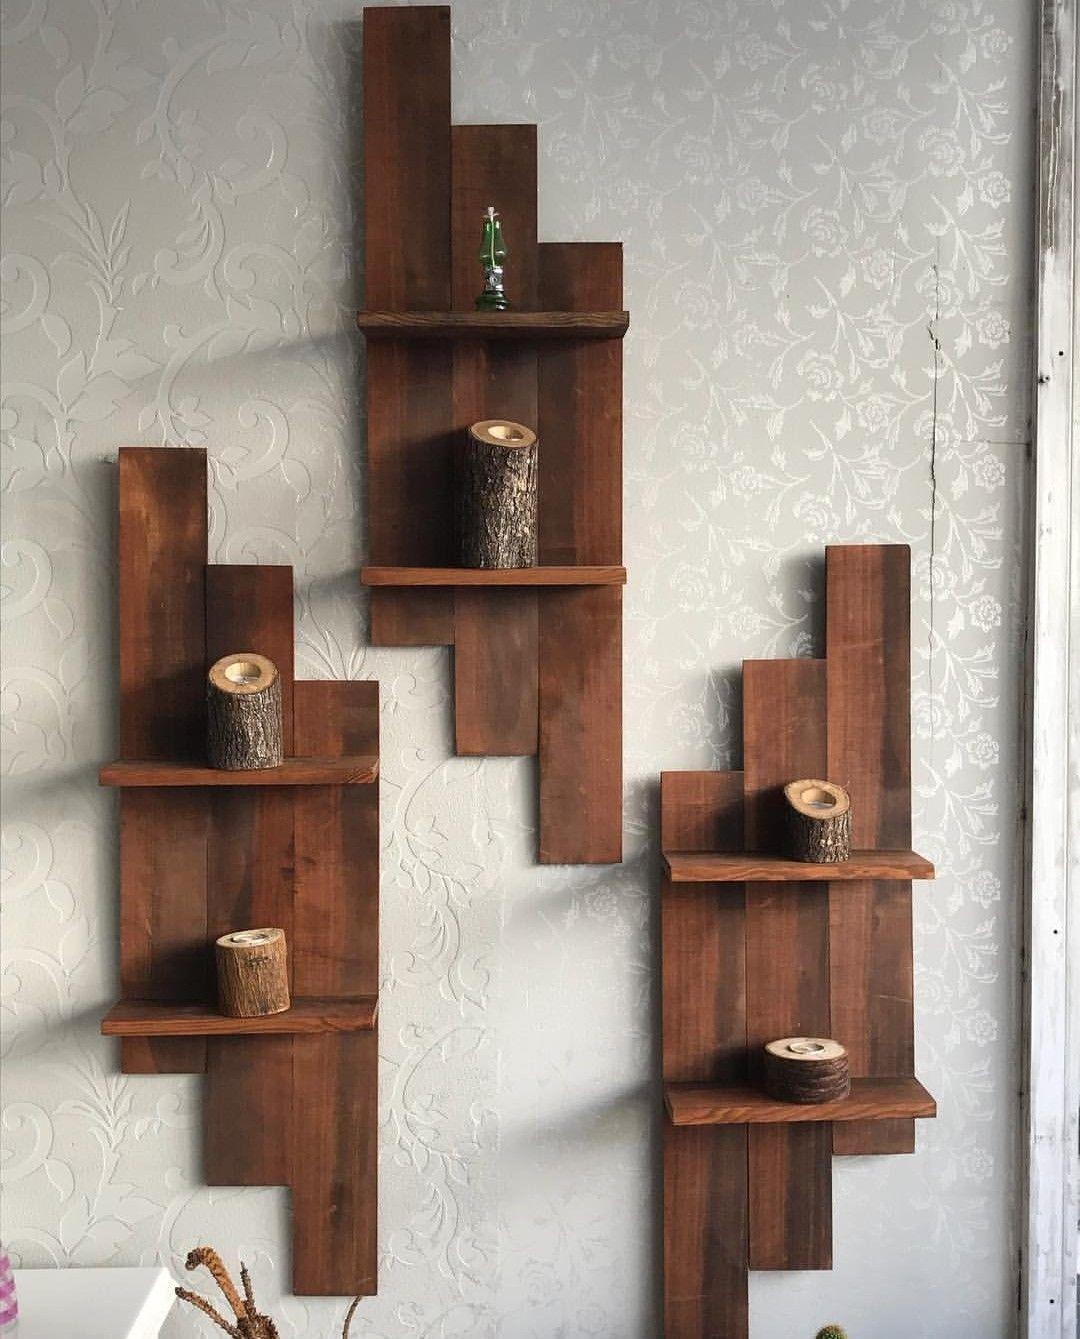 Prateleira Rustica De Madeira Macica Enfeite Todos Ambientes Mykinglist Com Dekorasi Kreatif Ide Dekorasi Rumah Kreatif